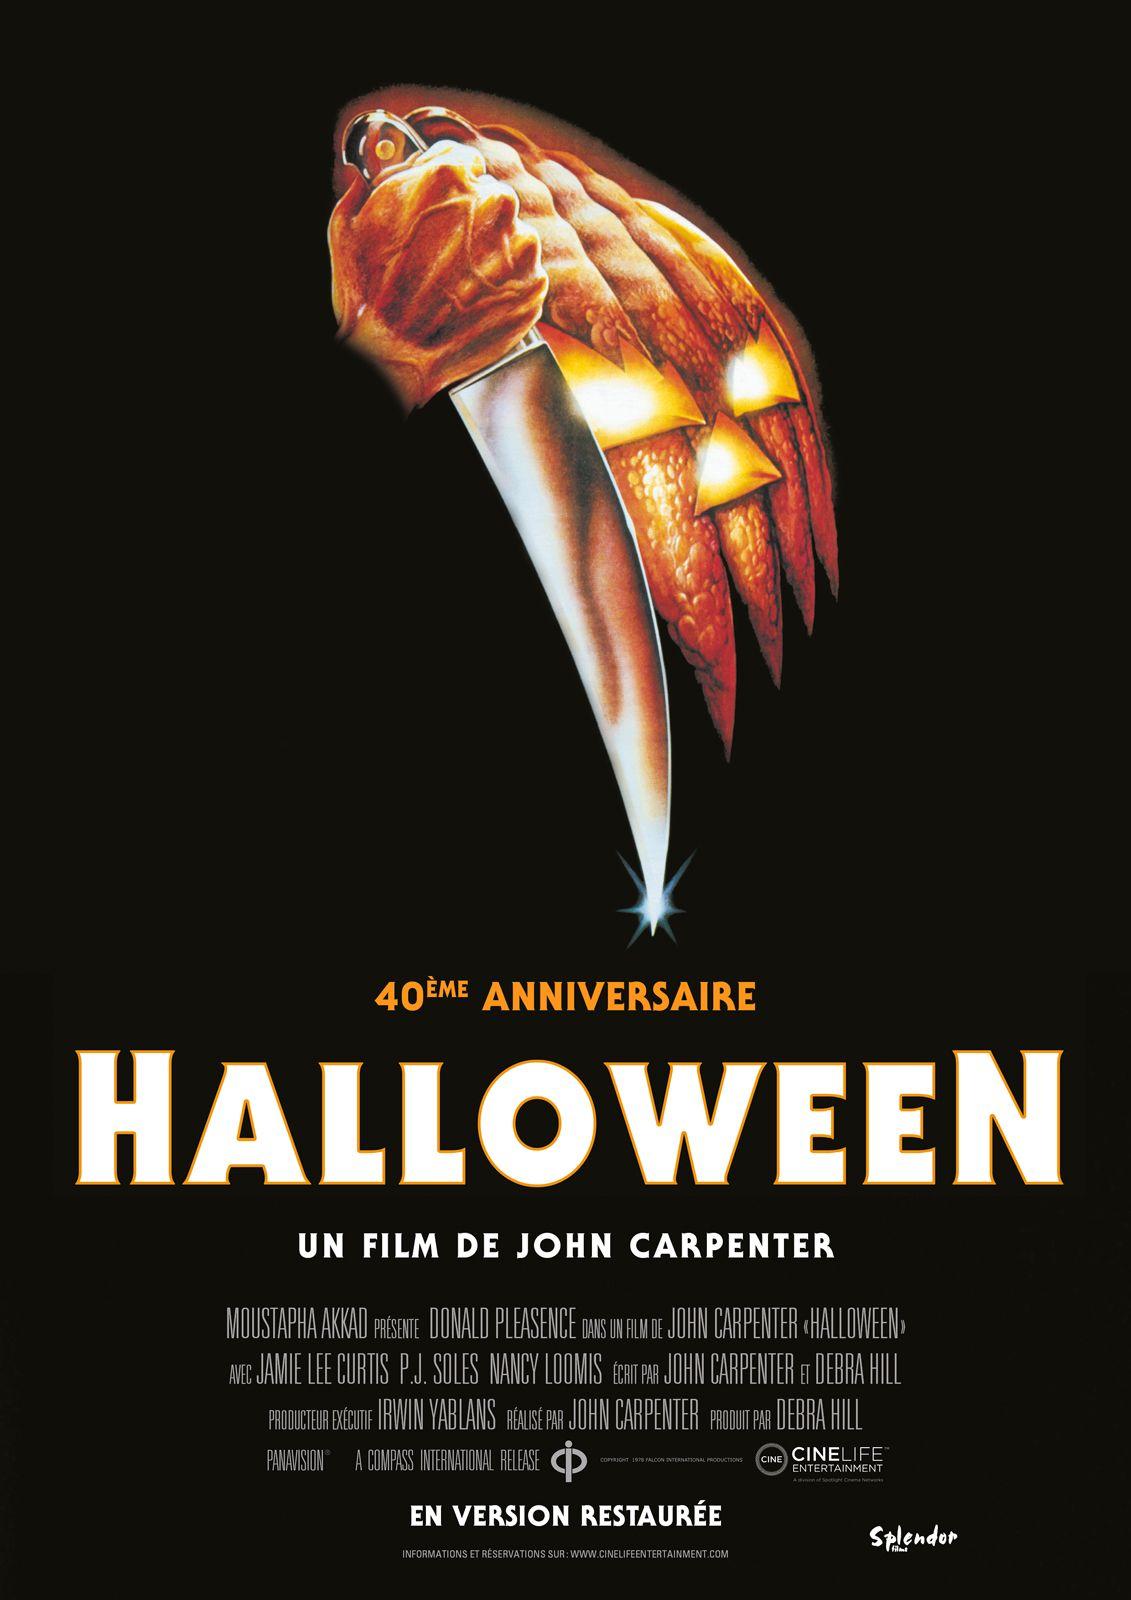 Regarder Halloween La Nuit Des Masques En Streaming Vf La Nuit Des Masques Film Halloween